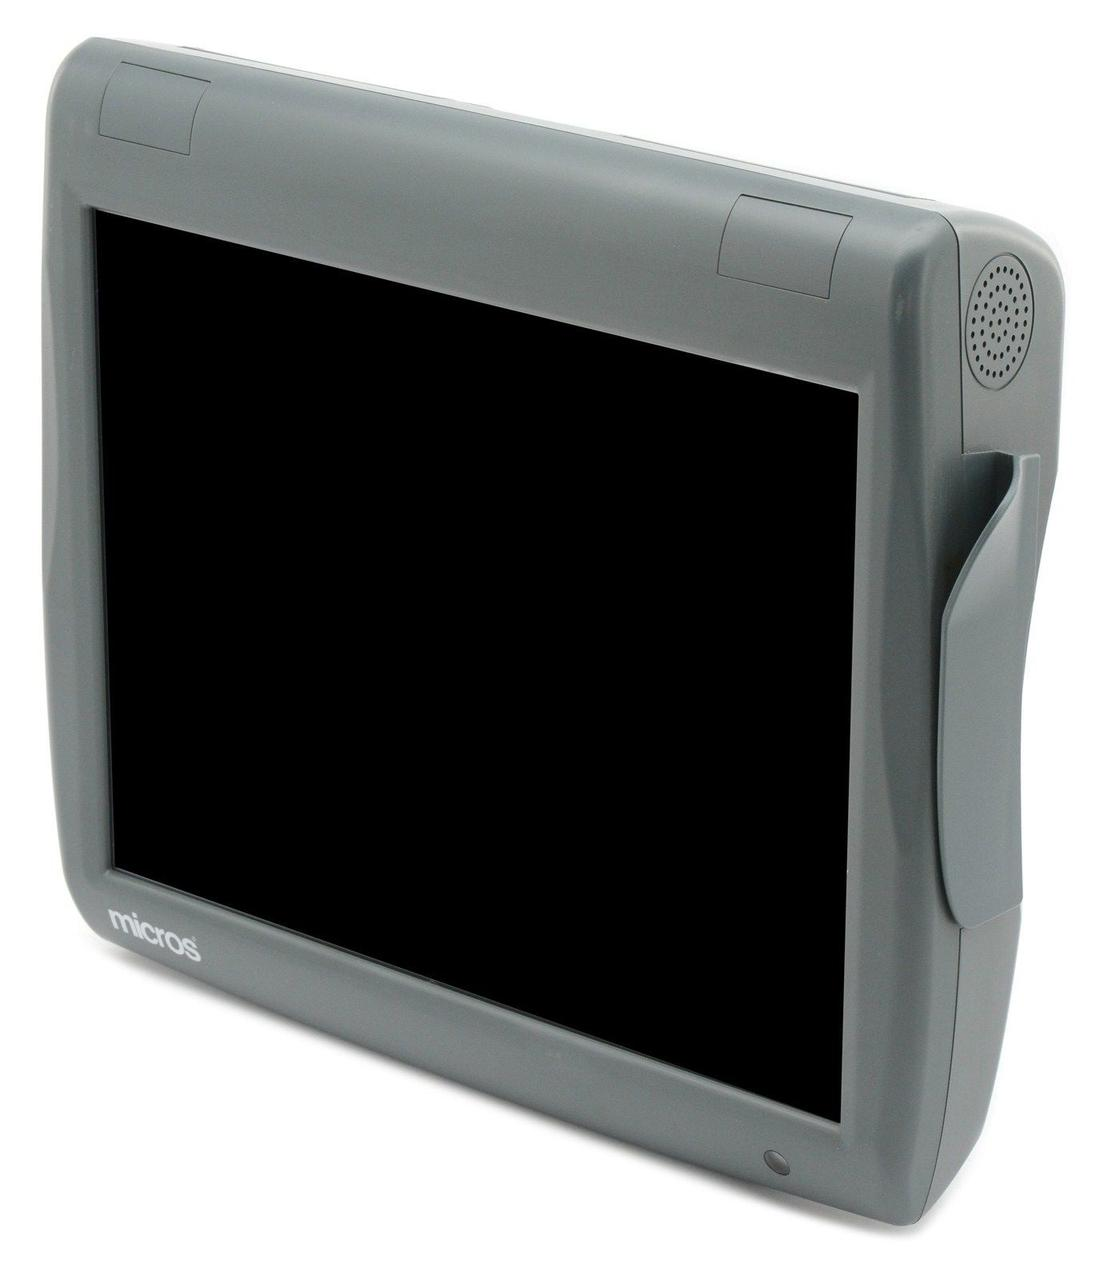 "Сенсорный POS-терминал Micros Workstation 5A 15"" Touchscreen Pos Terminal"